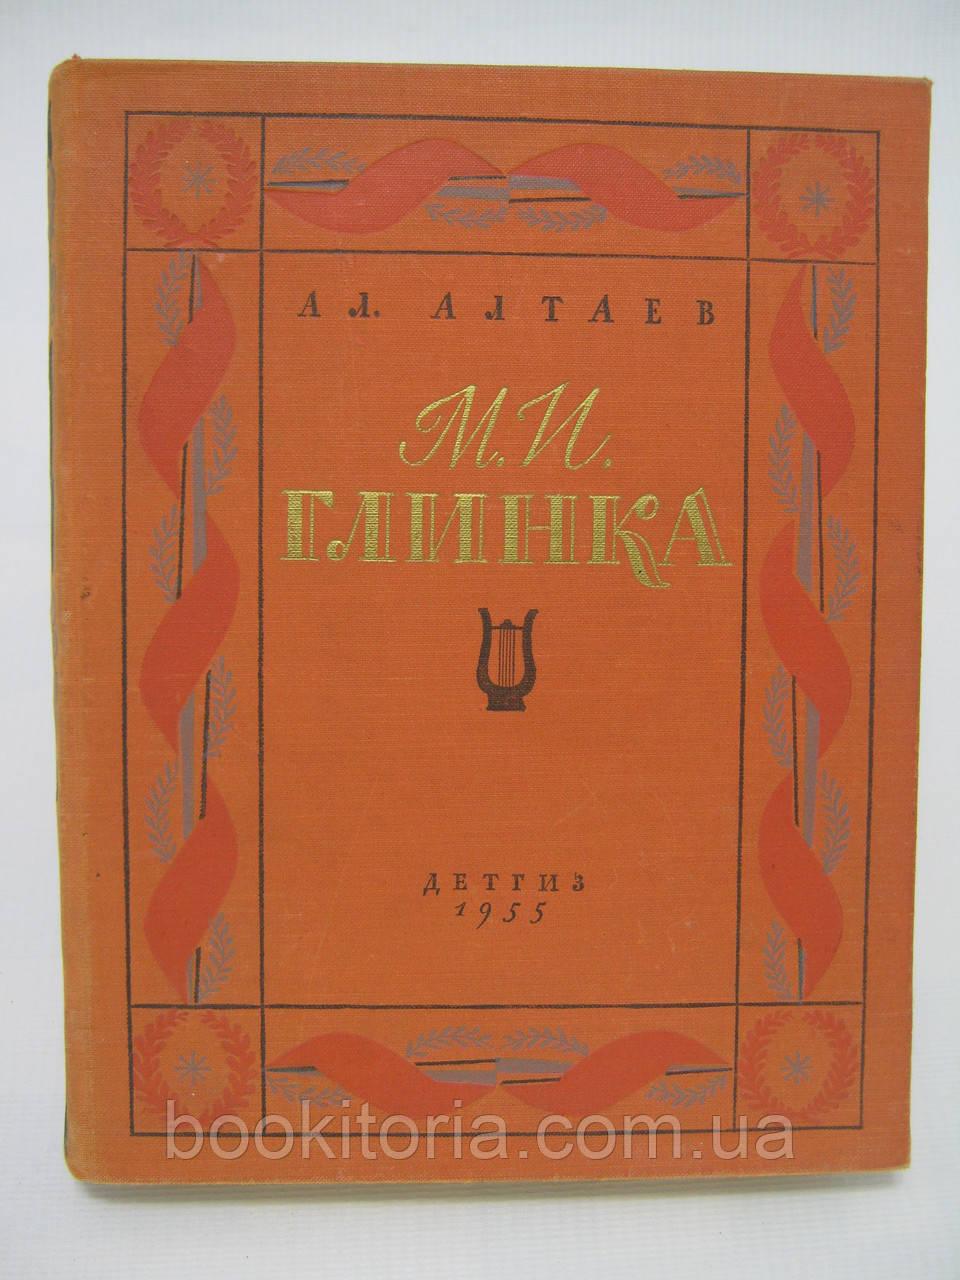 Алтаев А.Л. М.И. Глинка (б/у).